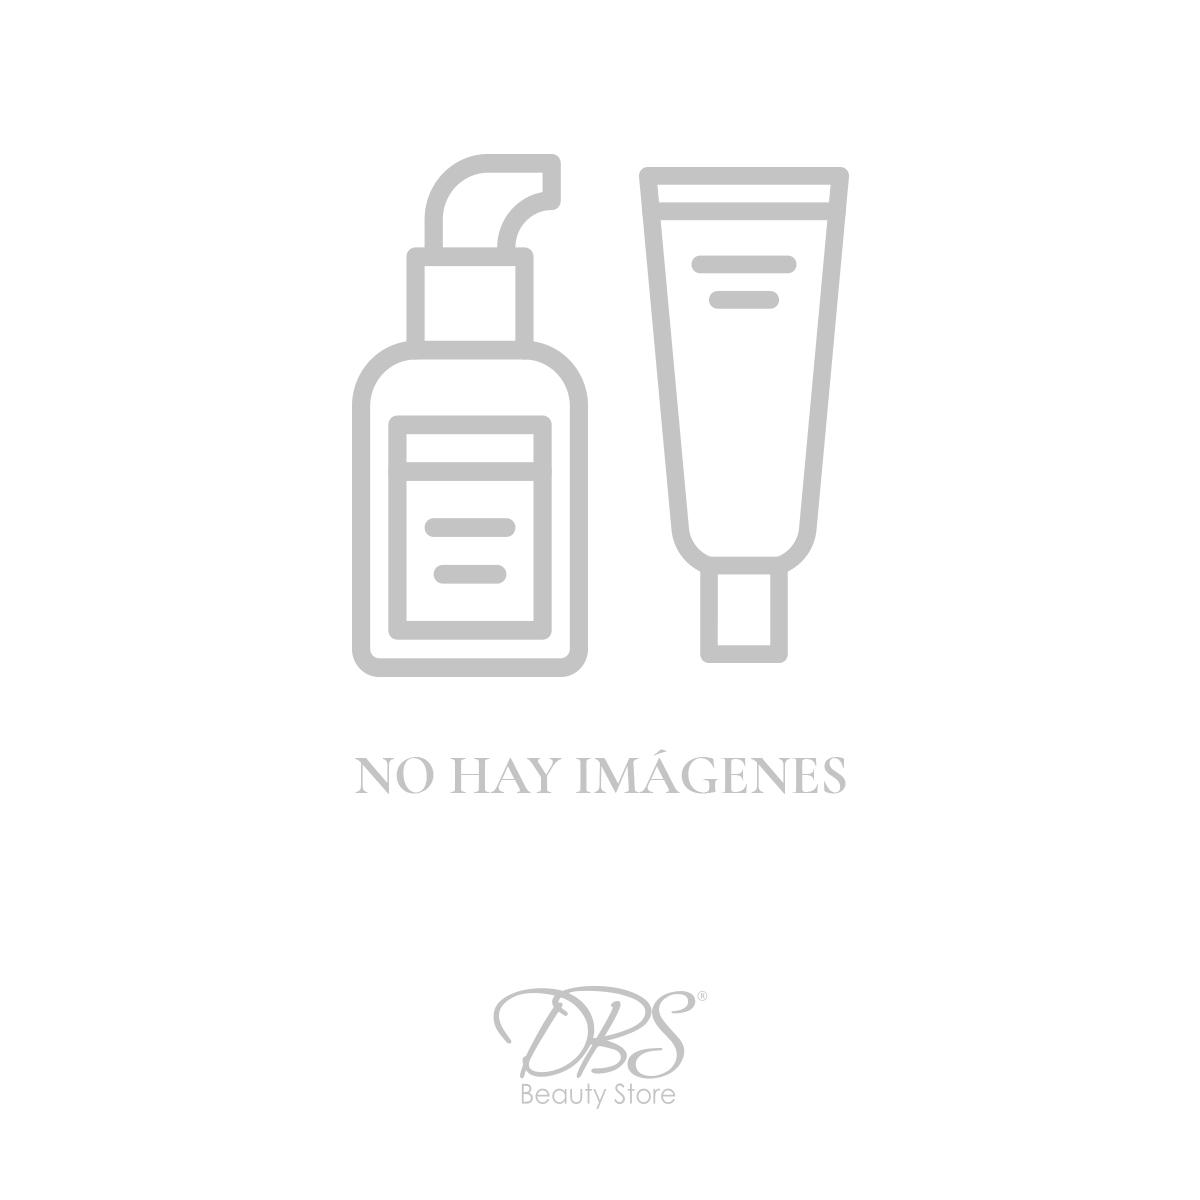 beauty-tools-BY-YS006-MP.jpg